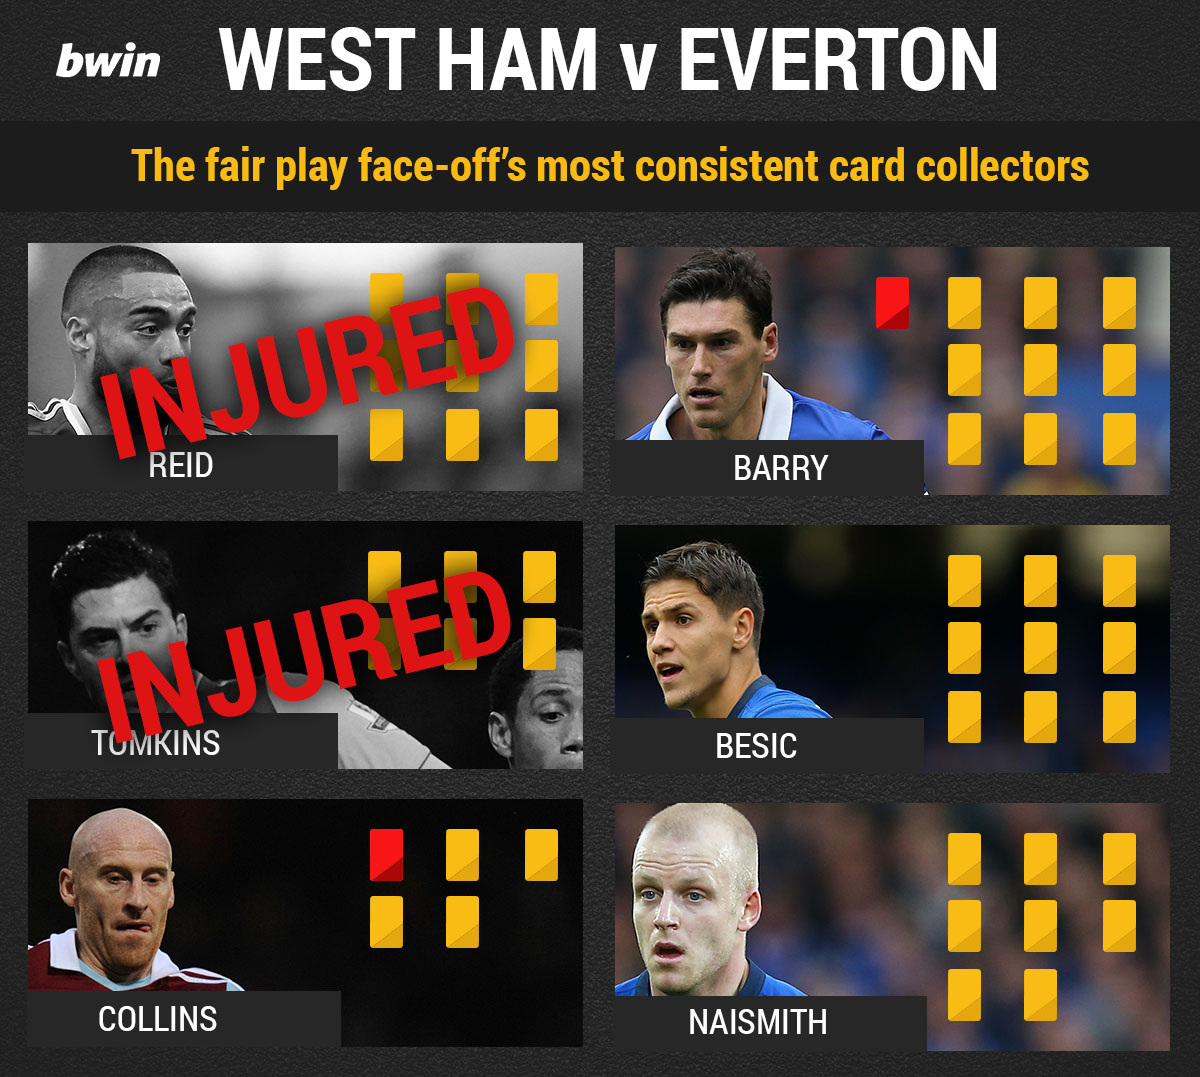 everton-westham-cards-2 copy